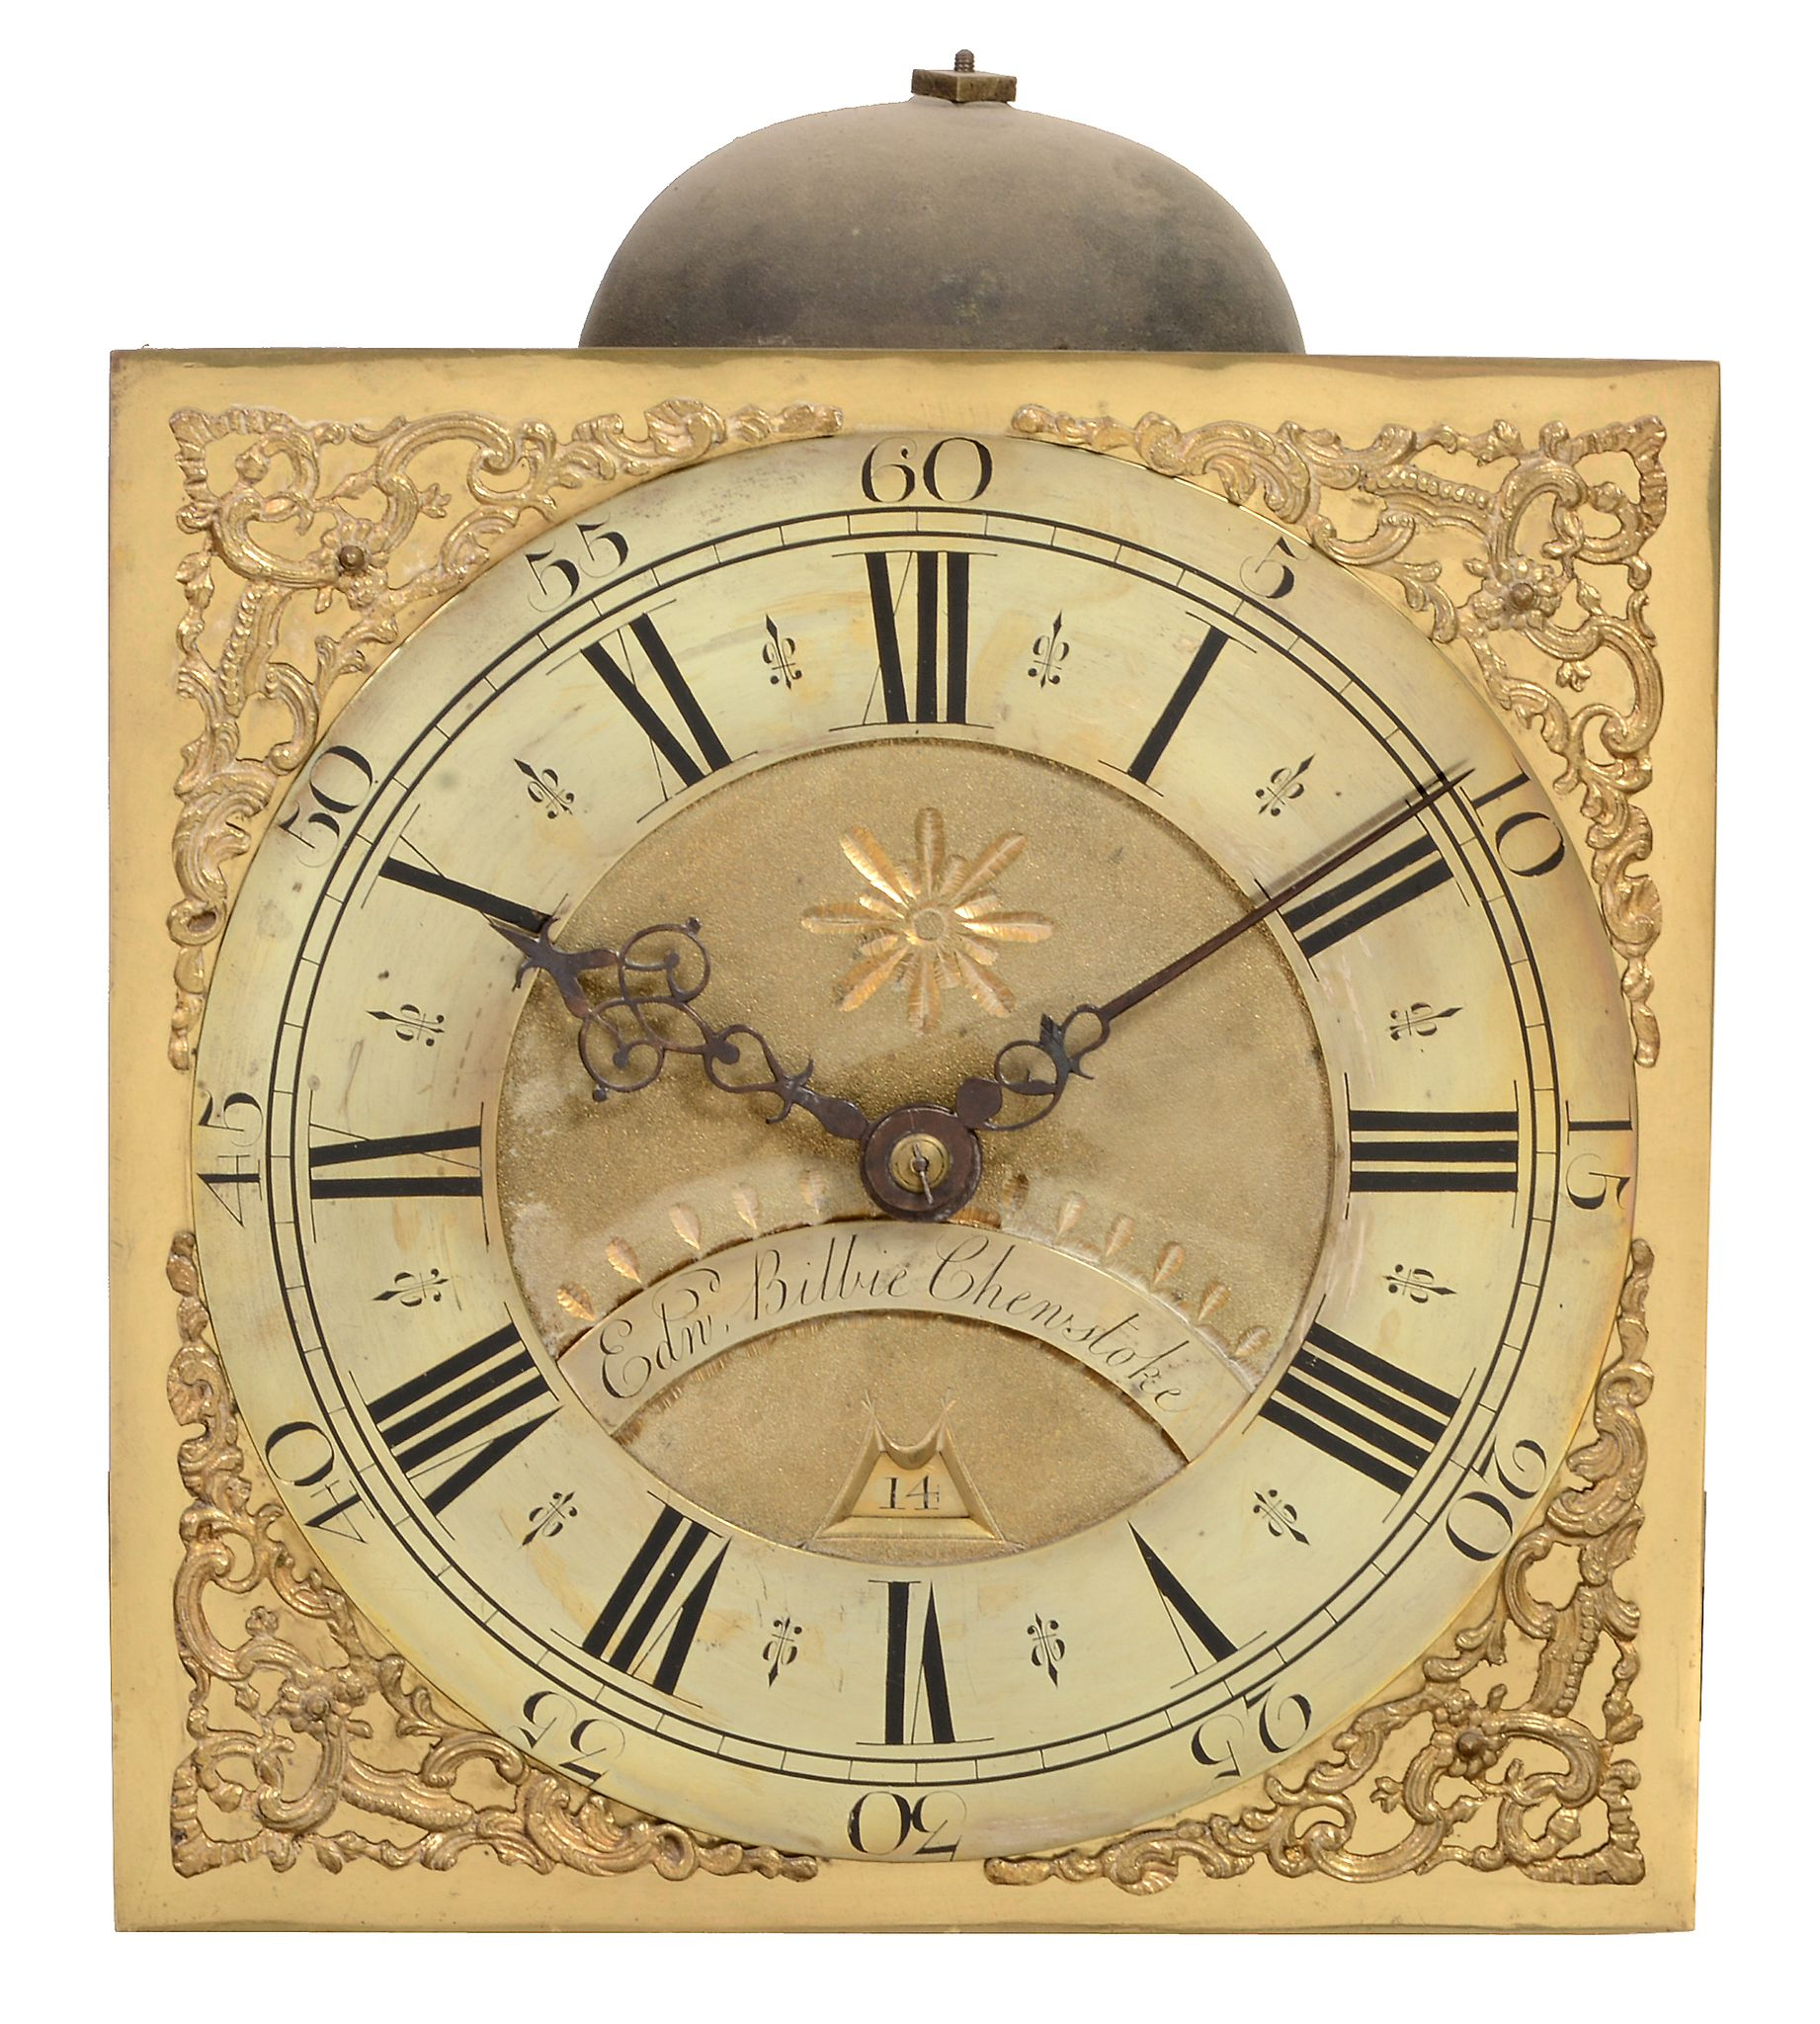 A George II oak thirty-hour longcase clock Edward Bilbie, Chew Stoke - Image 2 of 4